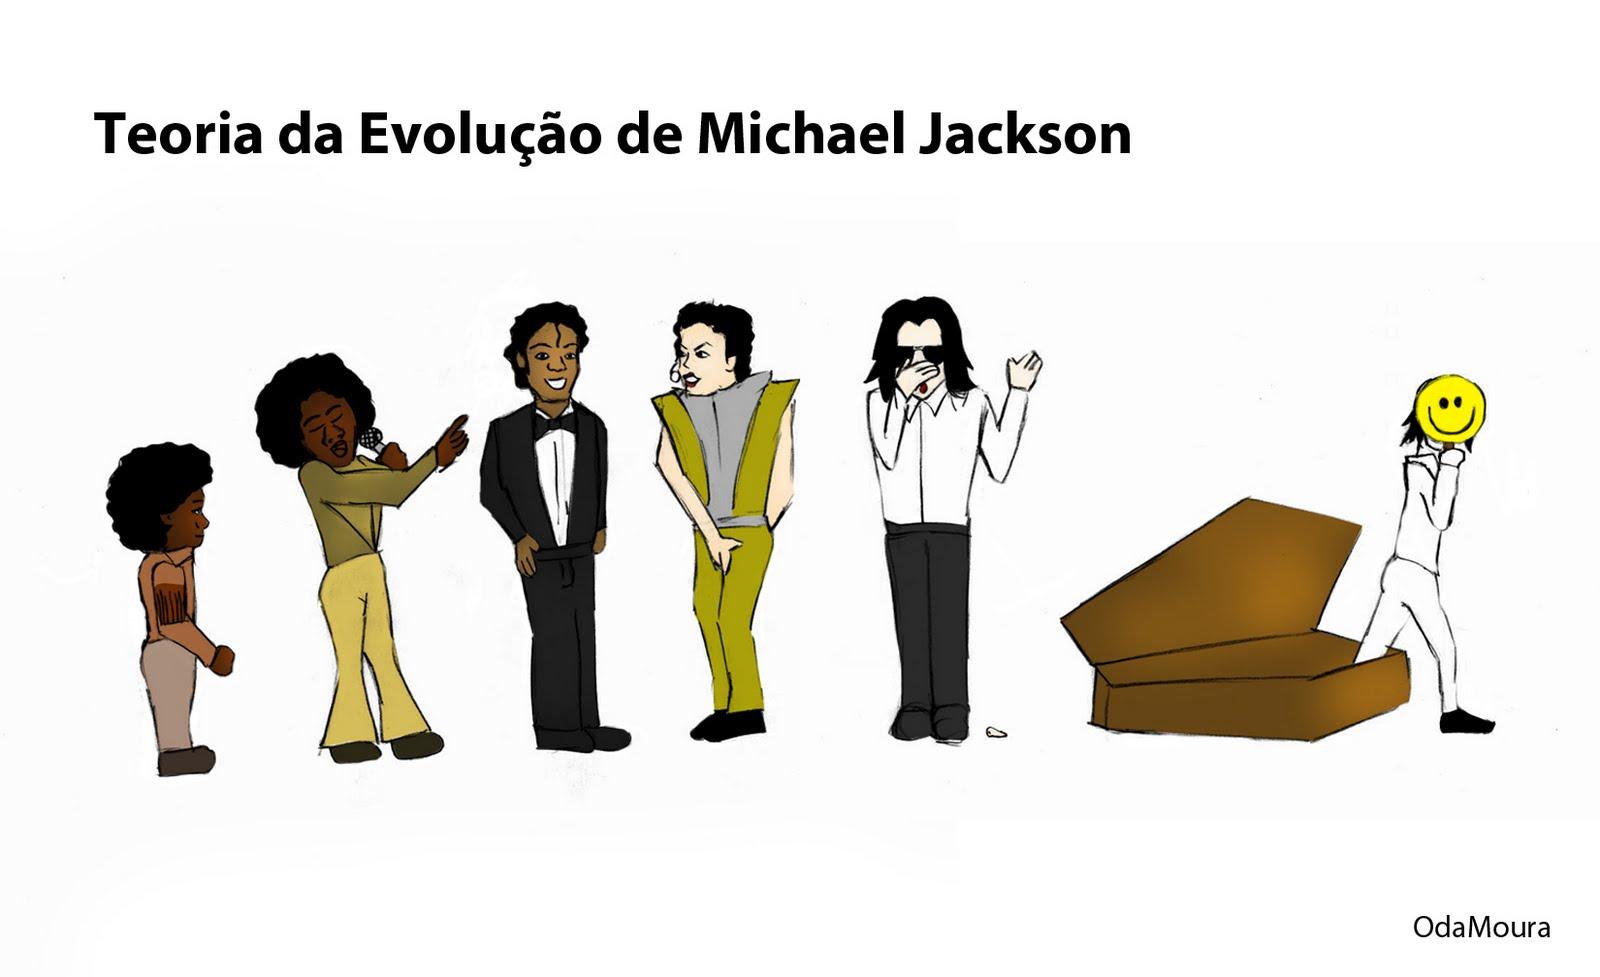 http://2.bp.blogspot.com/_5yuKrwCTdGg/TCVmuhbkTsI/AAAAAAAAAgc/Q1frx4zb0x0/s1600/Evolu%C3%A7%C3%A3o+de+michael+jackson.jpg